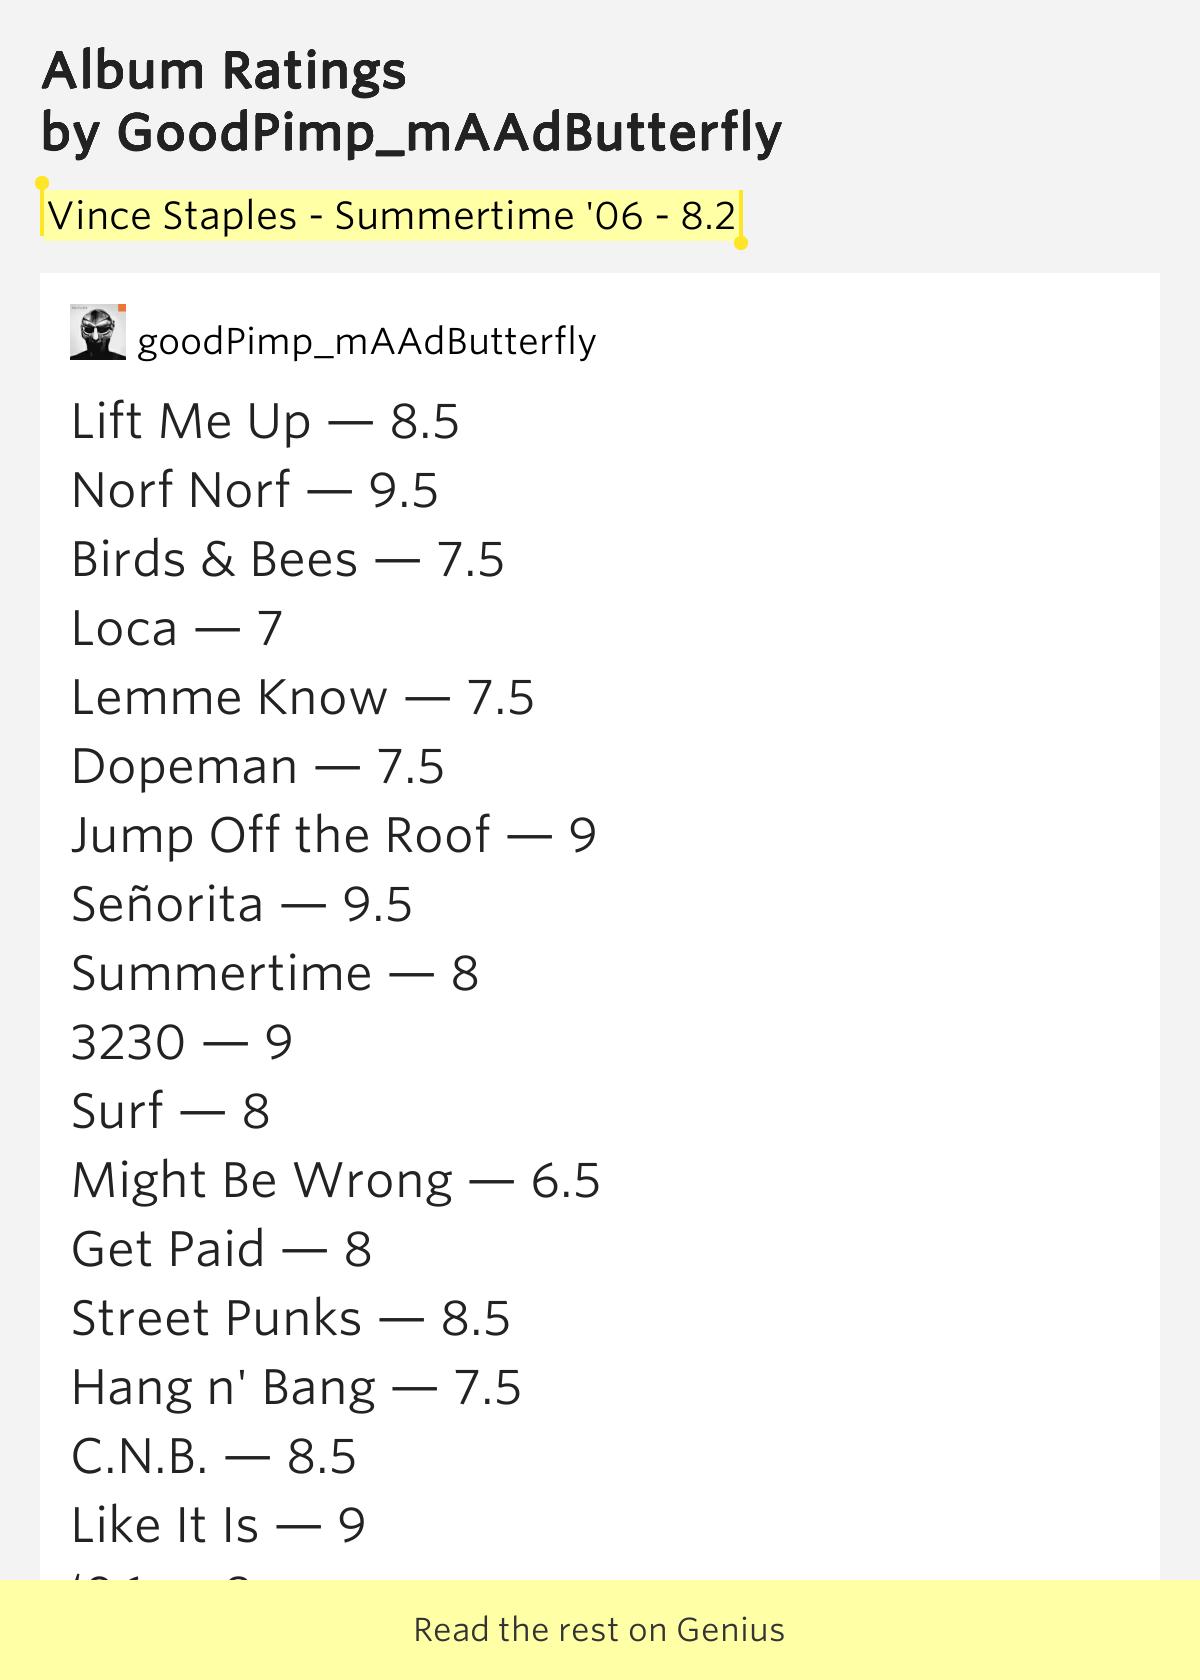 Vince Staples Summertime 06 8 2 Album Ratings Meaning